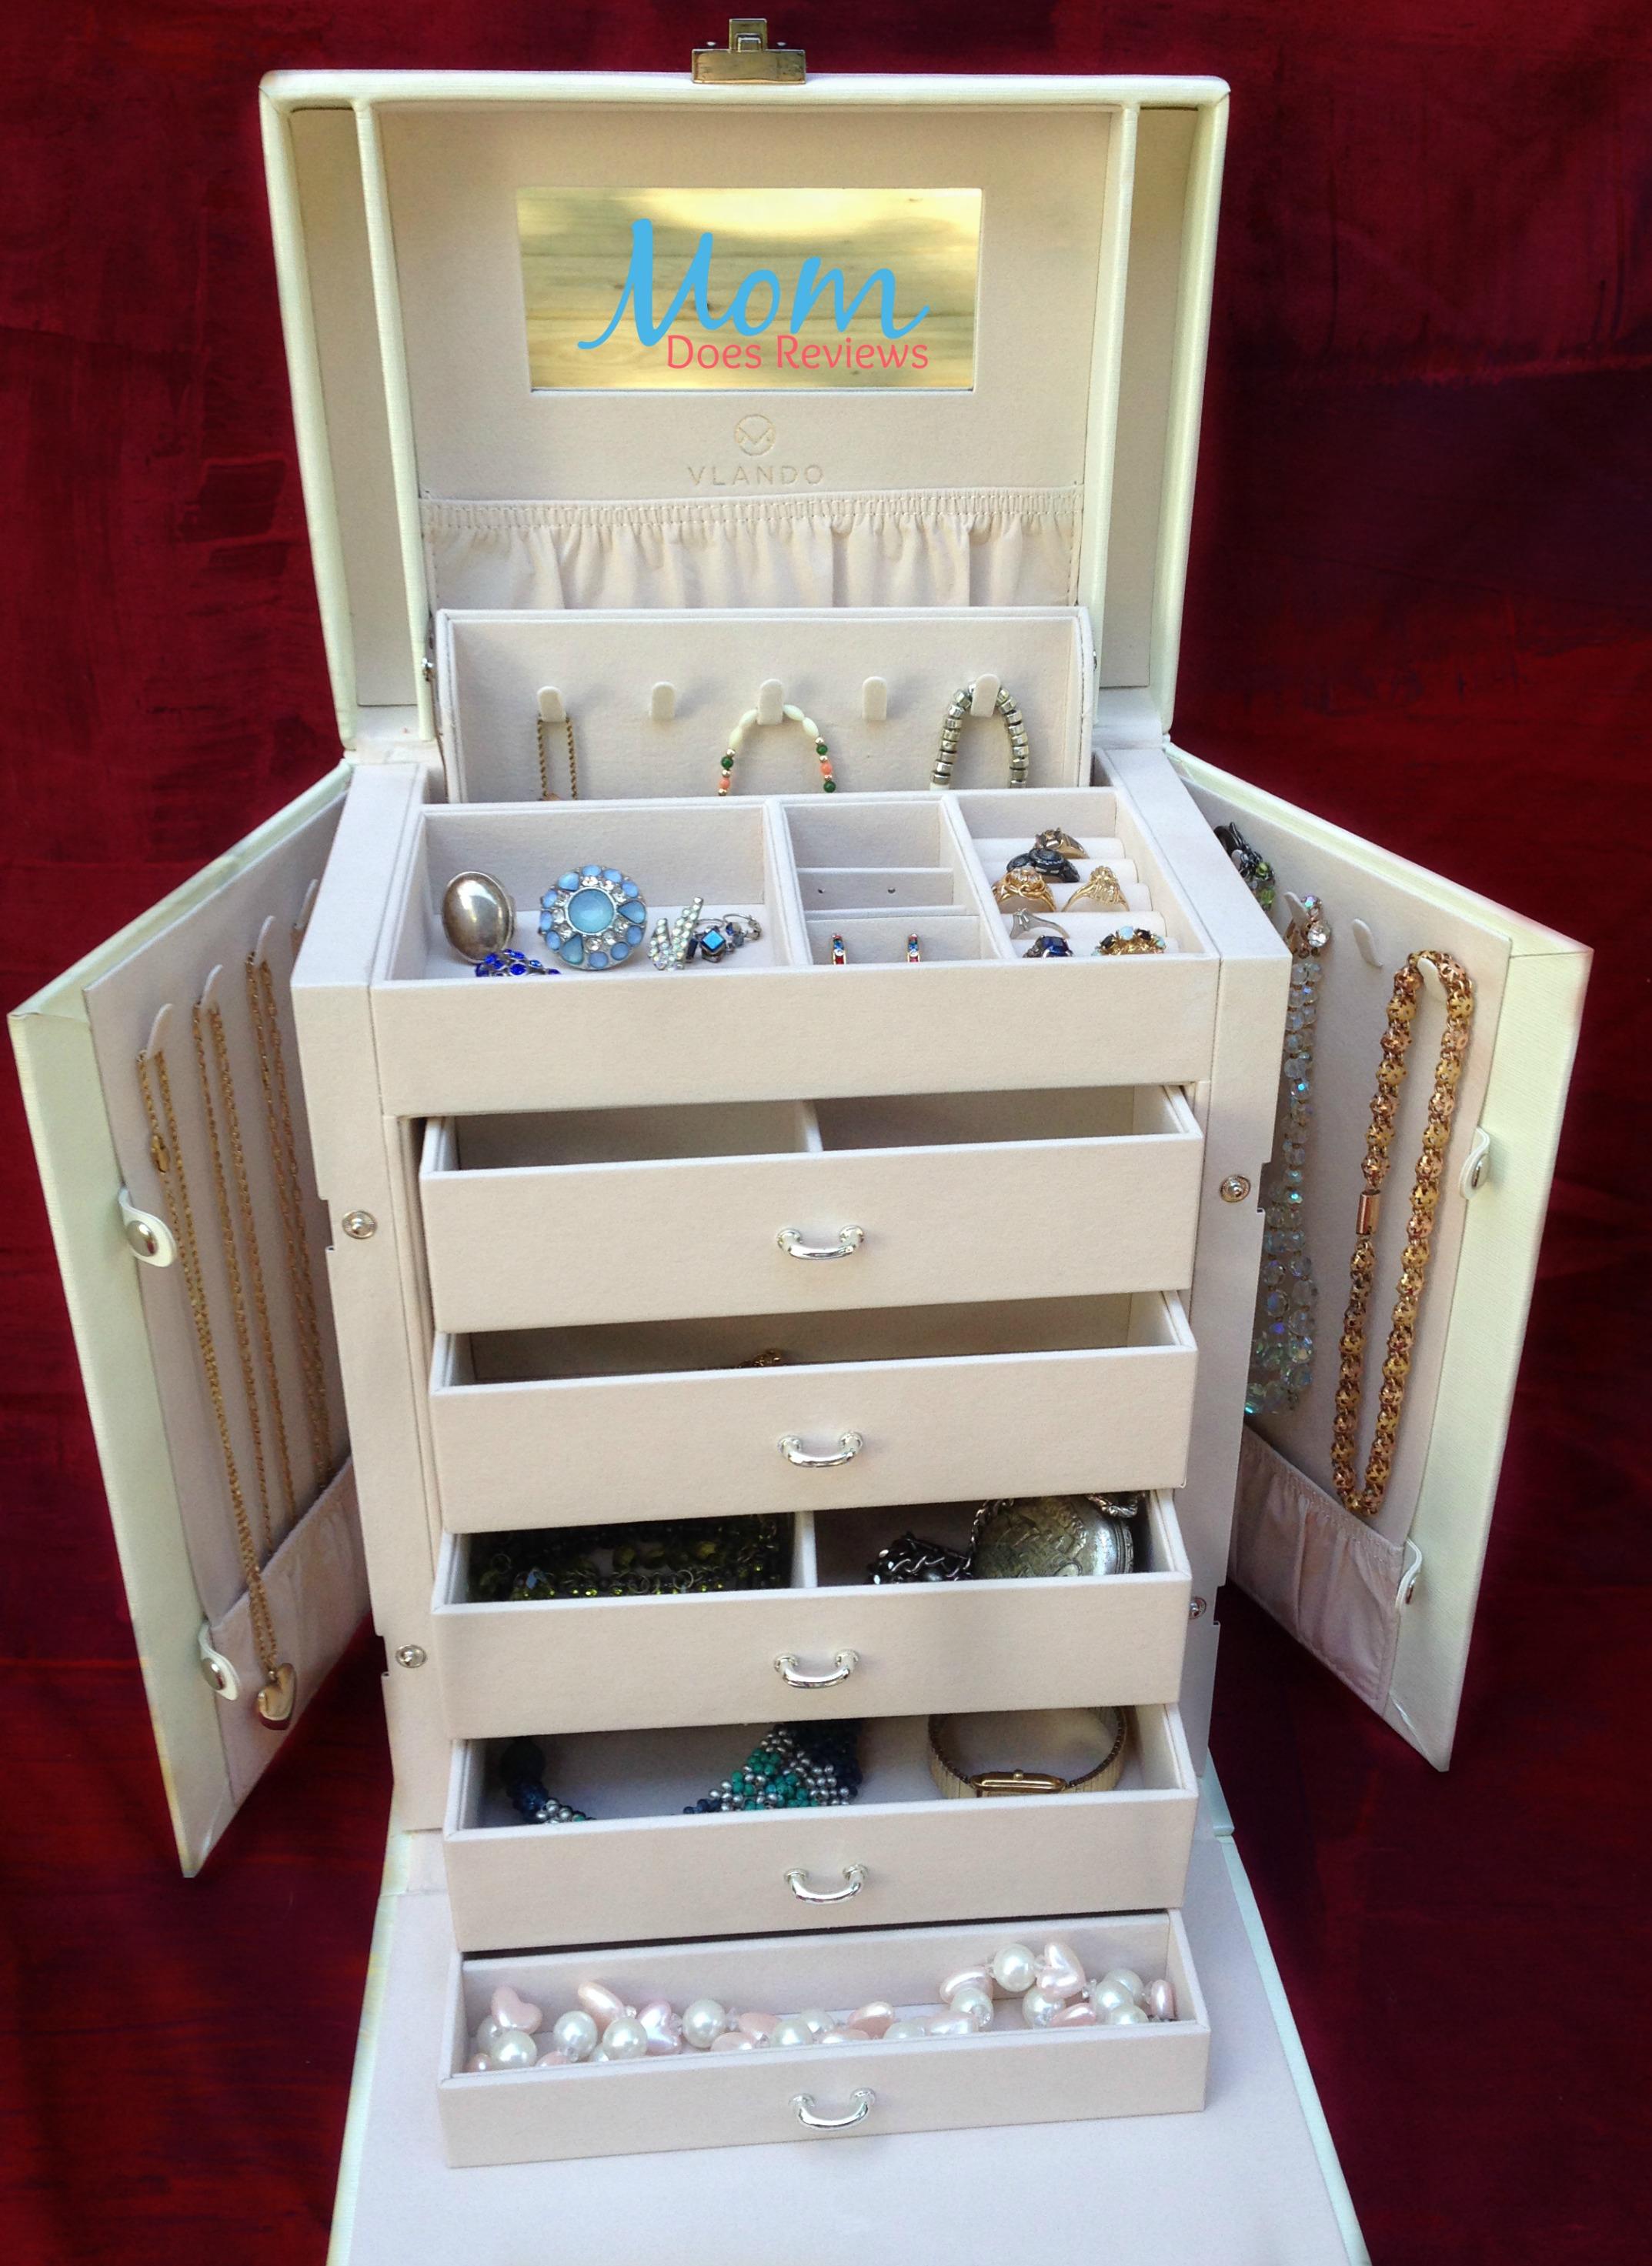 Vlando The Jewelry Box Every Woman Needs Review Mom